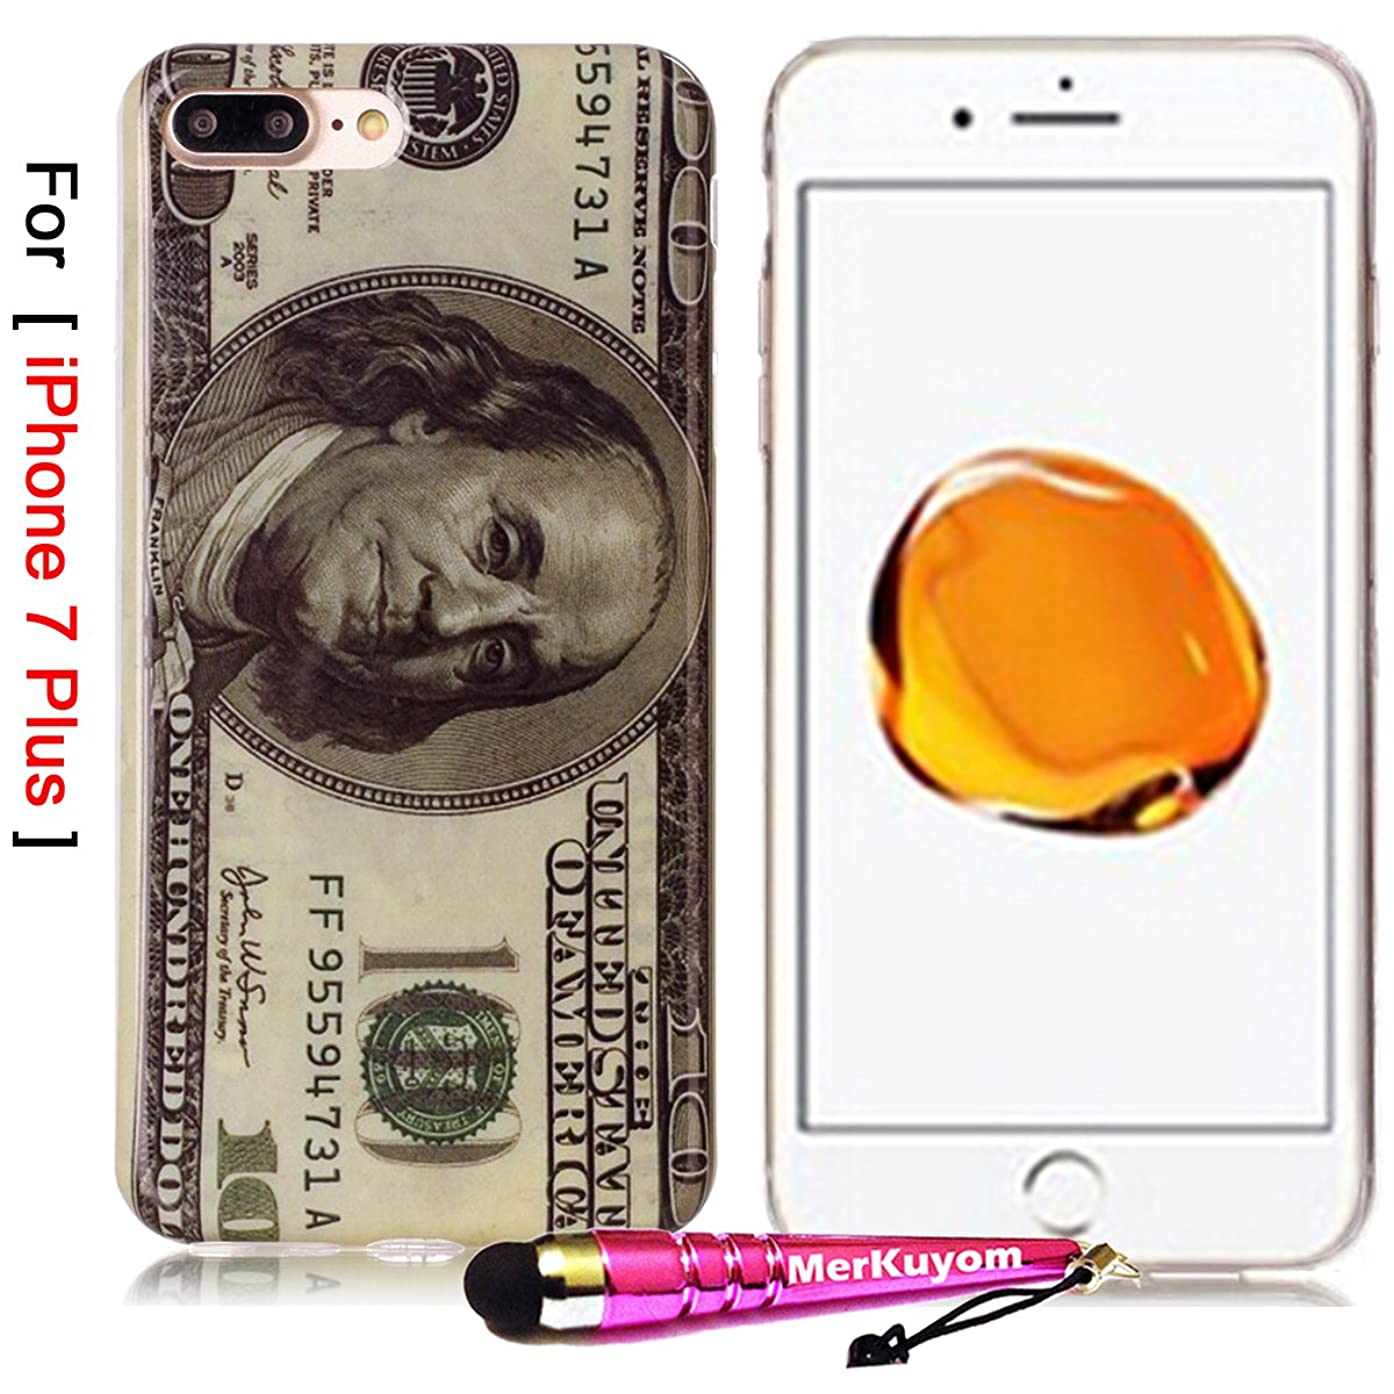 iPhone 7 Plus - Case, MerKuyom [Slim-Fit] [Flexible Gel] Soft TPU Case Skin Cover W/ Stylus For Apple iPhone 7 Plus , iPhone 7Plus (2016) – 5.5 inch (US Money Pattern)